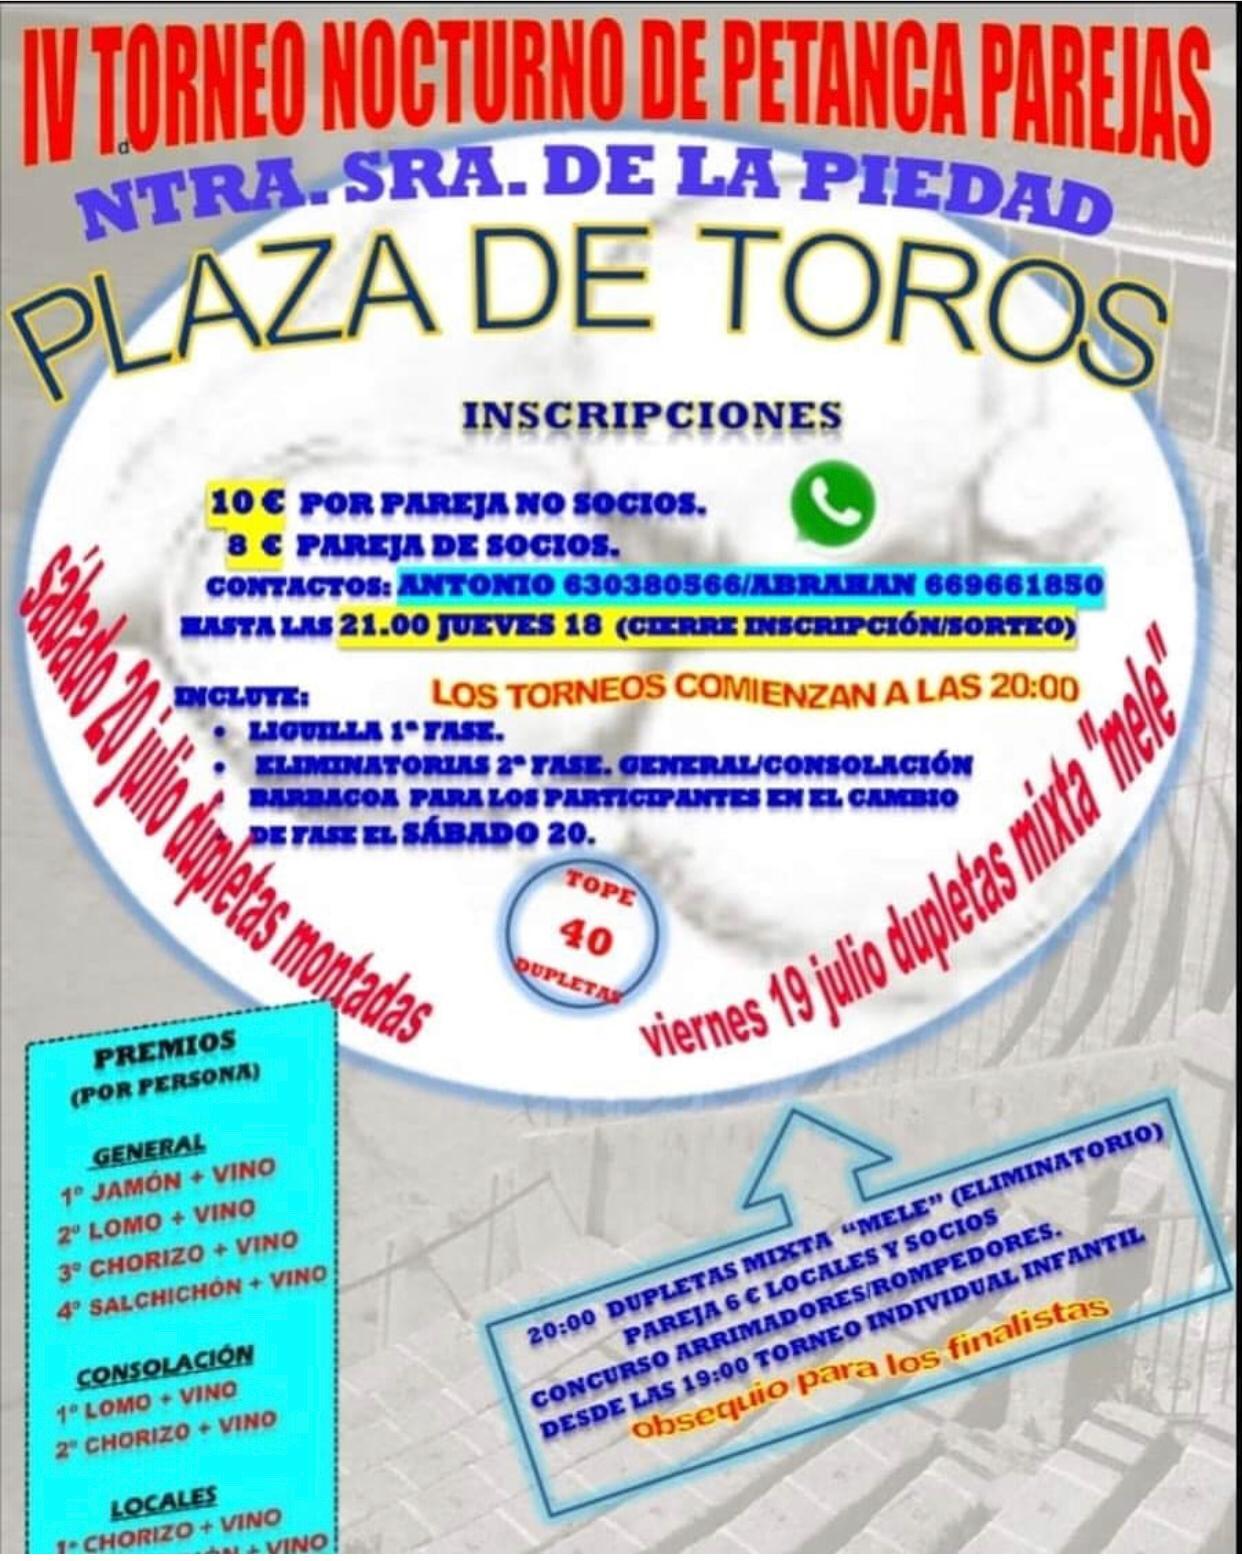 IV Torneo nocturno de petanca parejas - Trujillo (Cáceres)